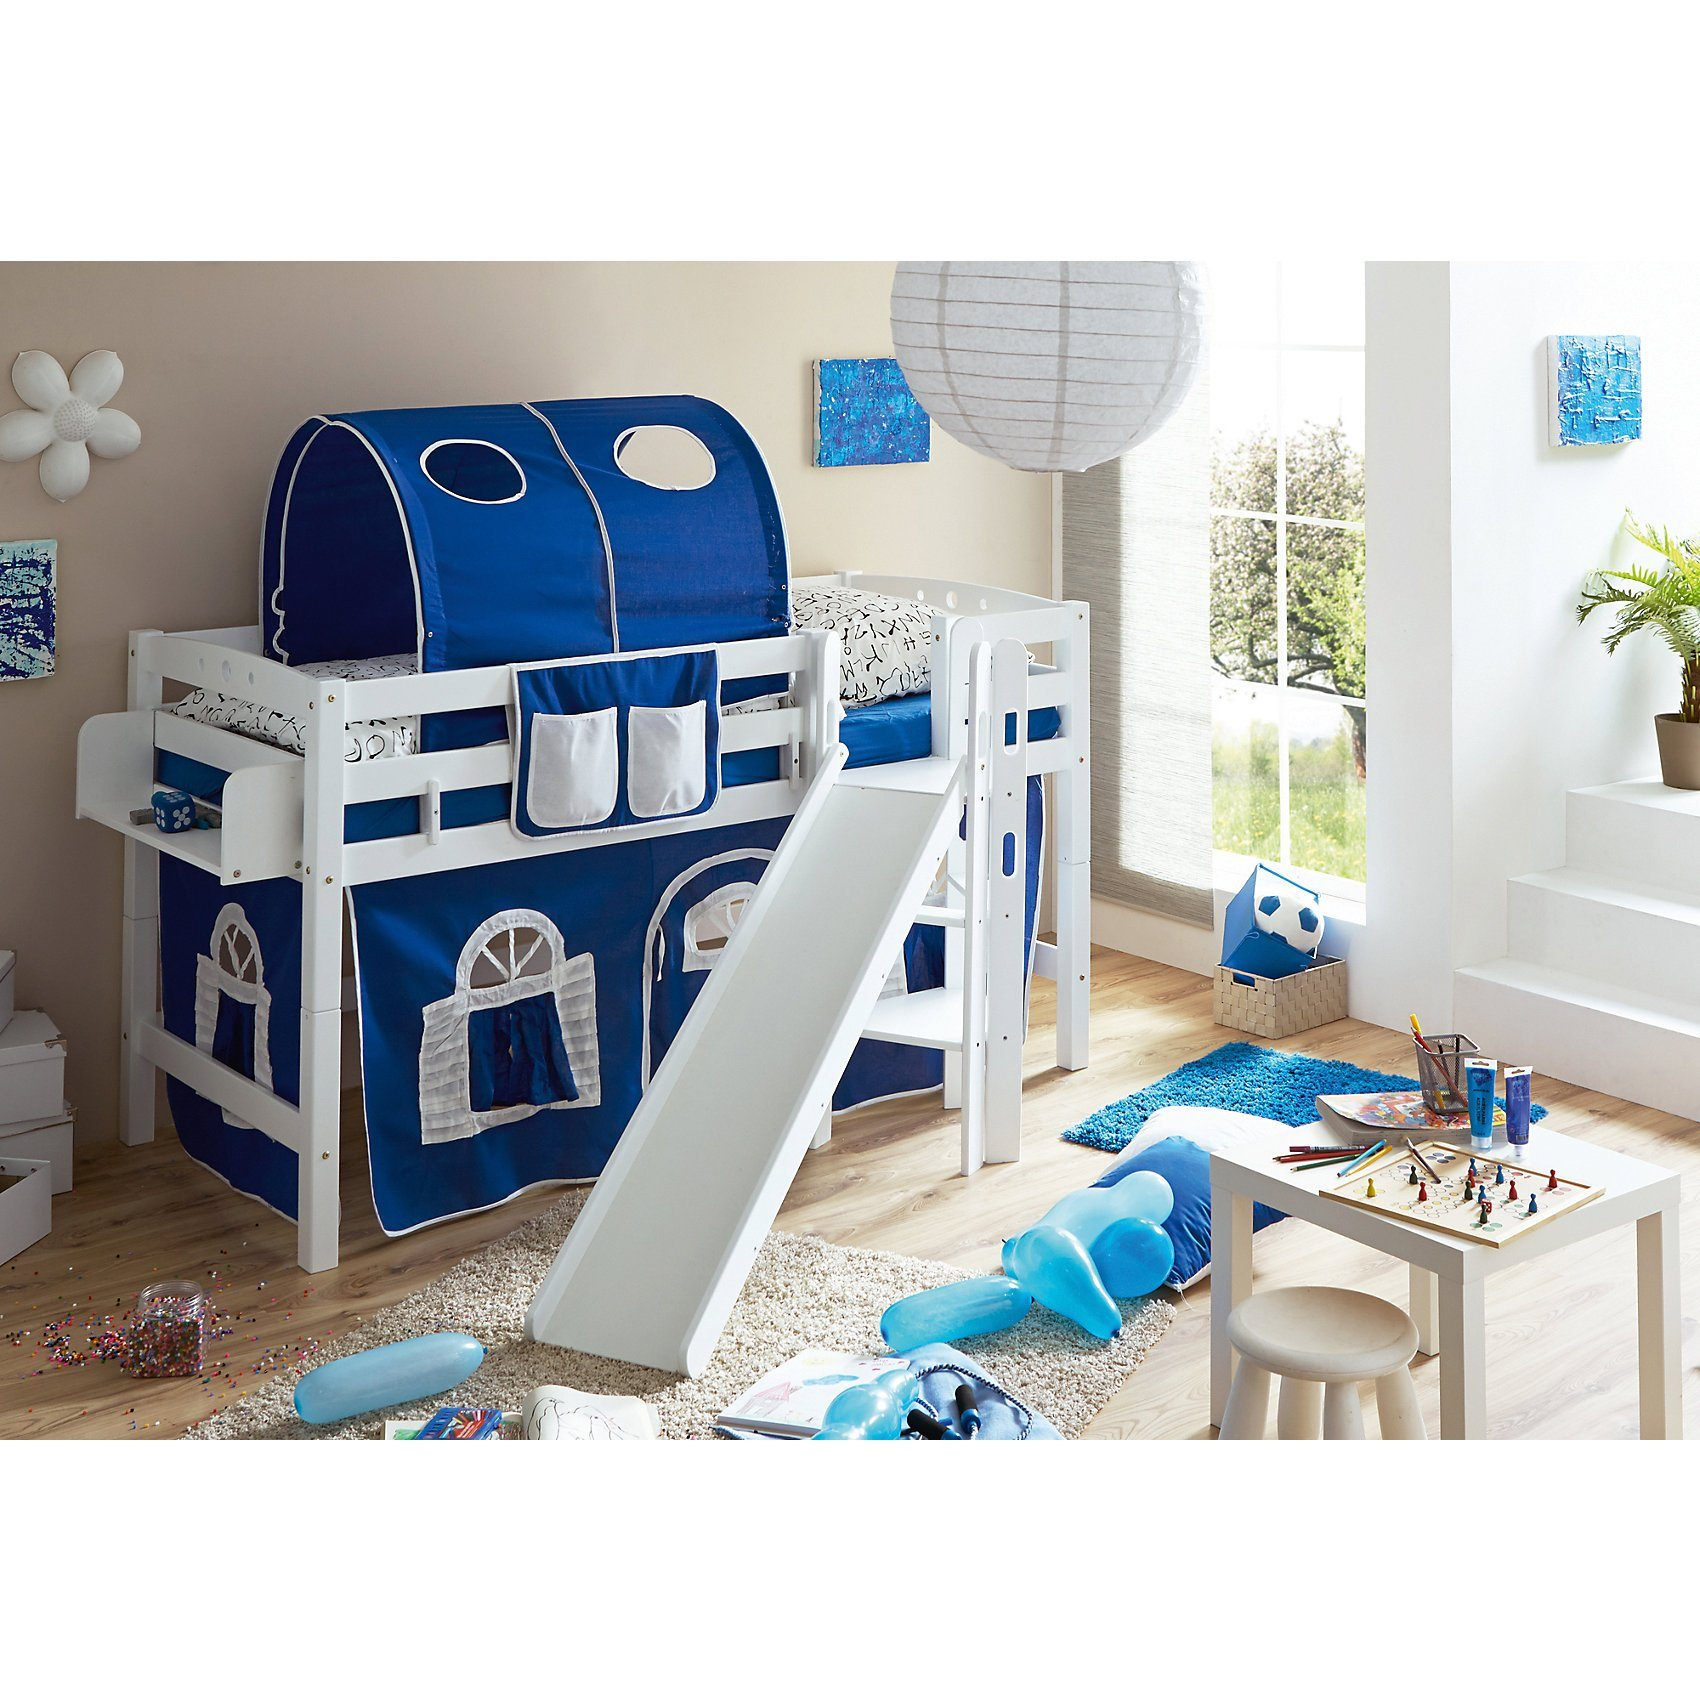 TICAA Spielbett Tino, Buche massiv, weiß lackiert, blau-weiß, 90 x